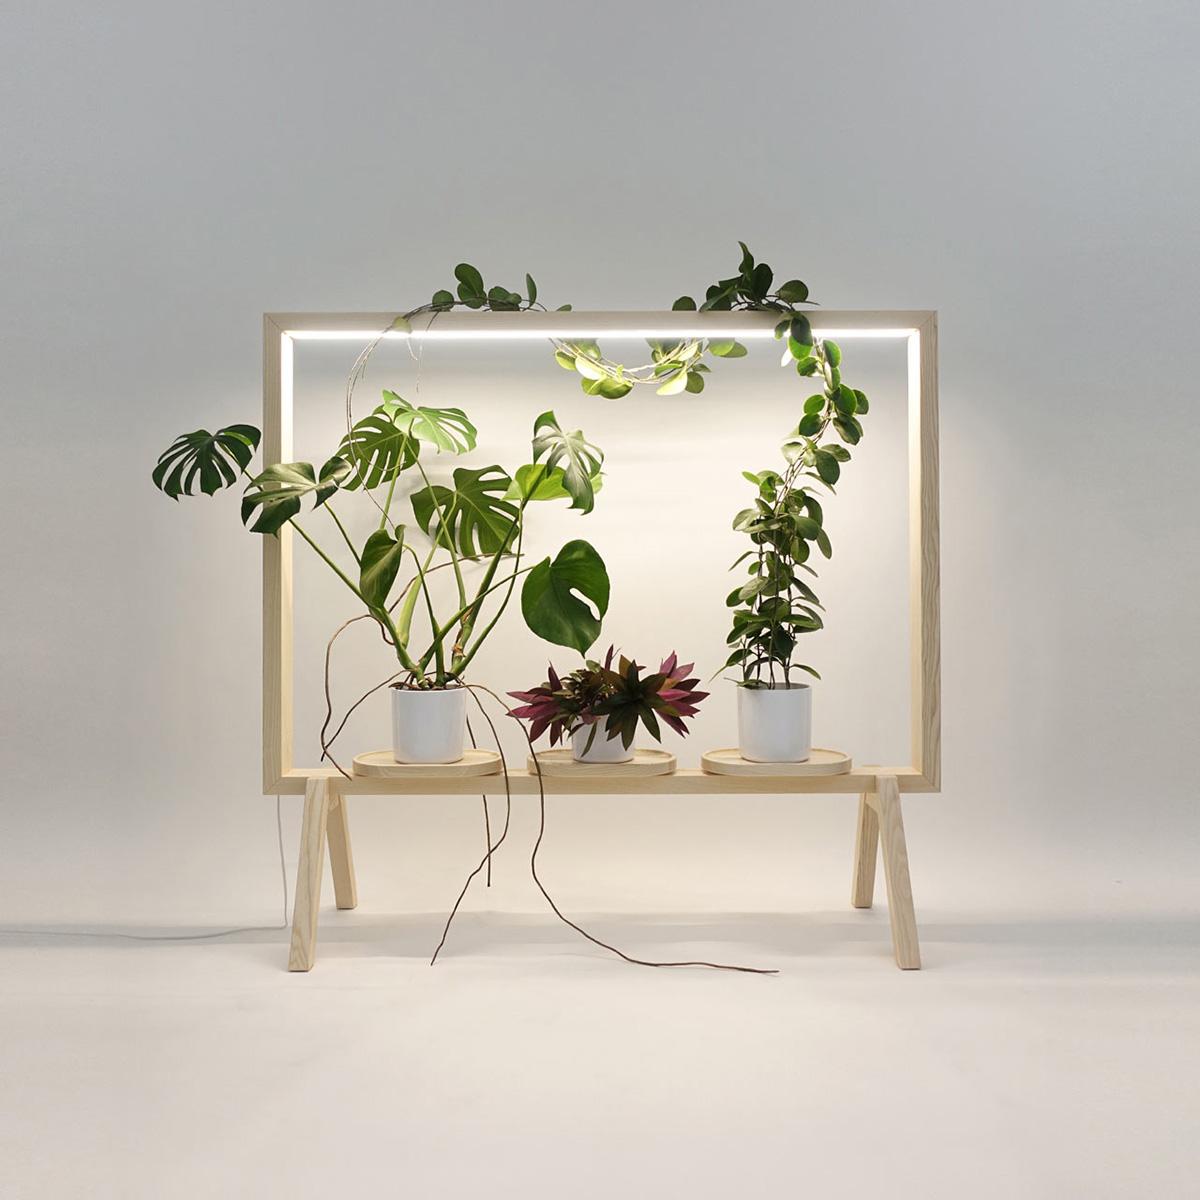 03-limbus-greenframe-kauppi-kauppi